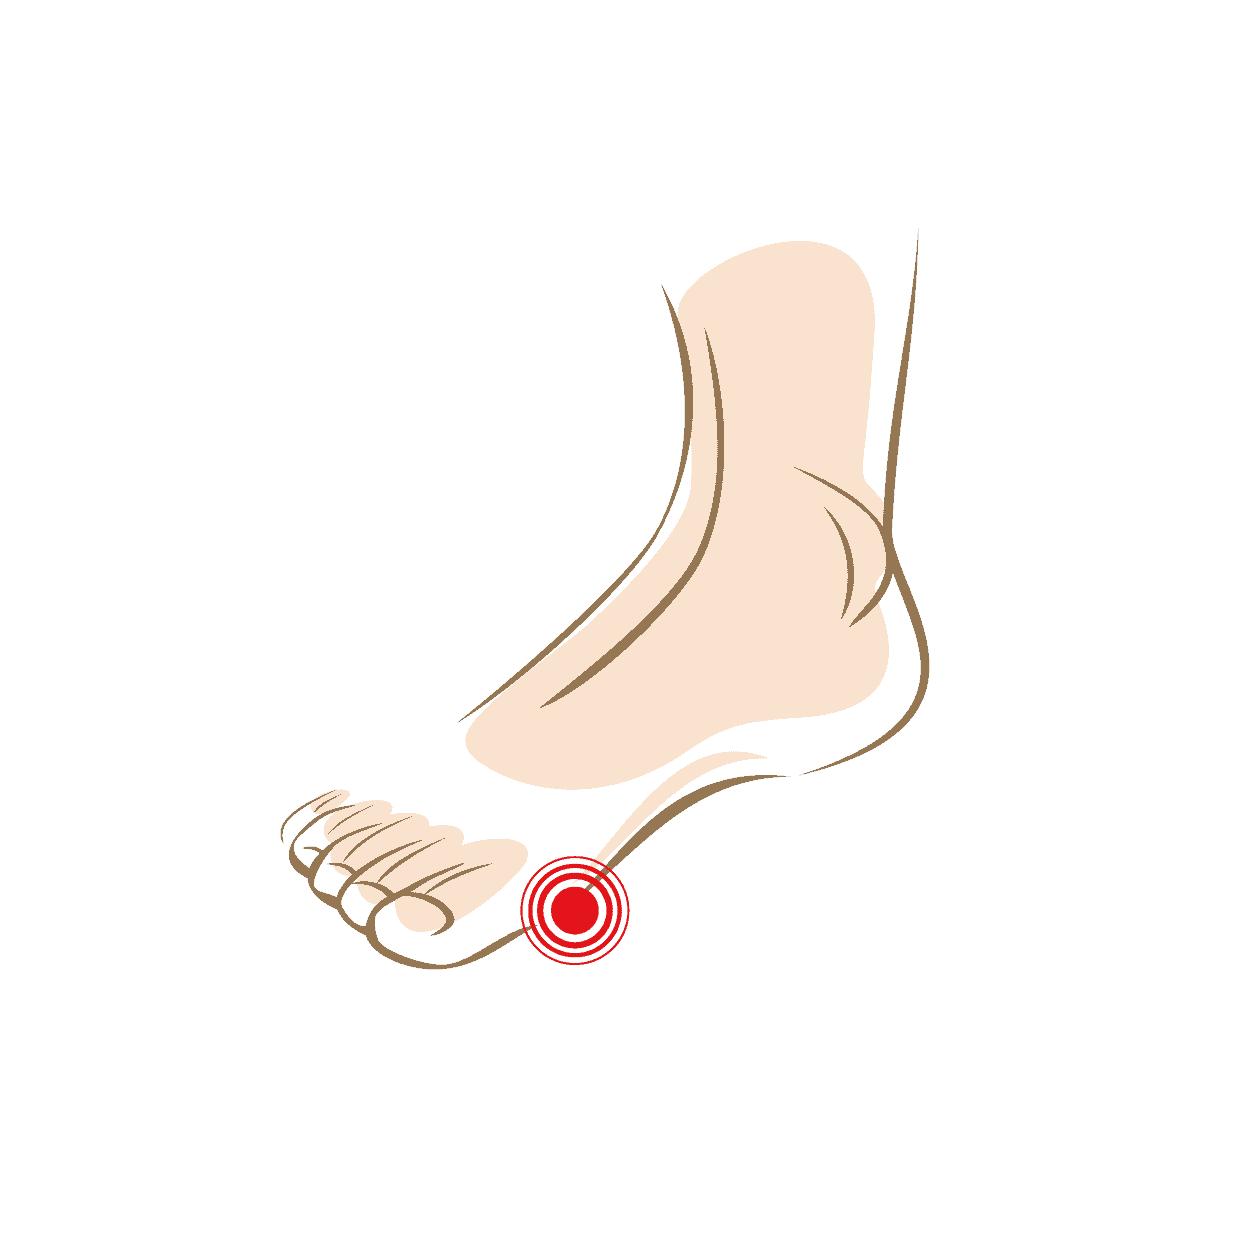 Bovenkant voet pijn